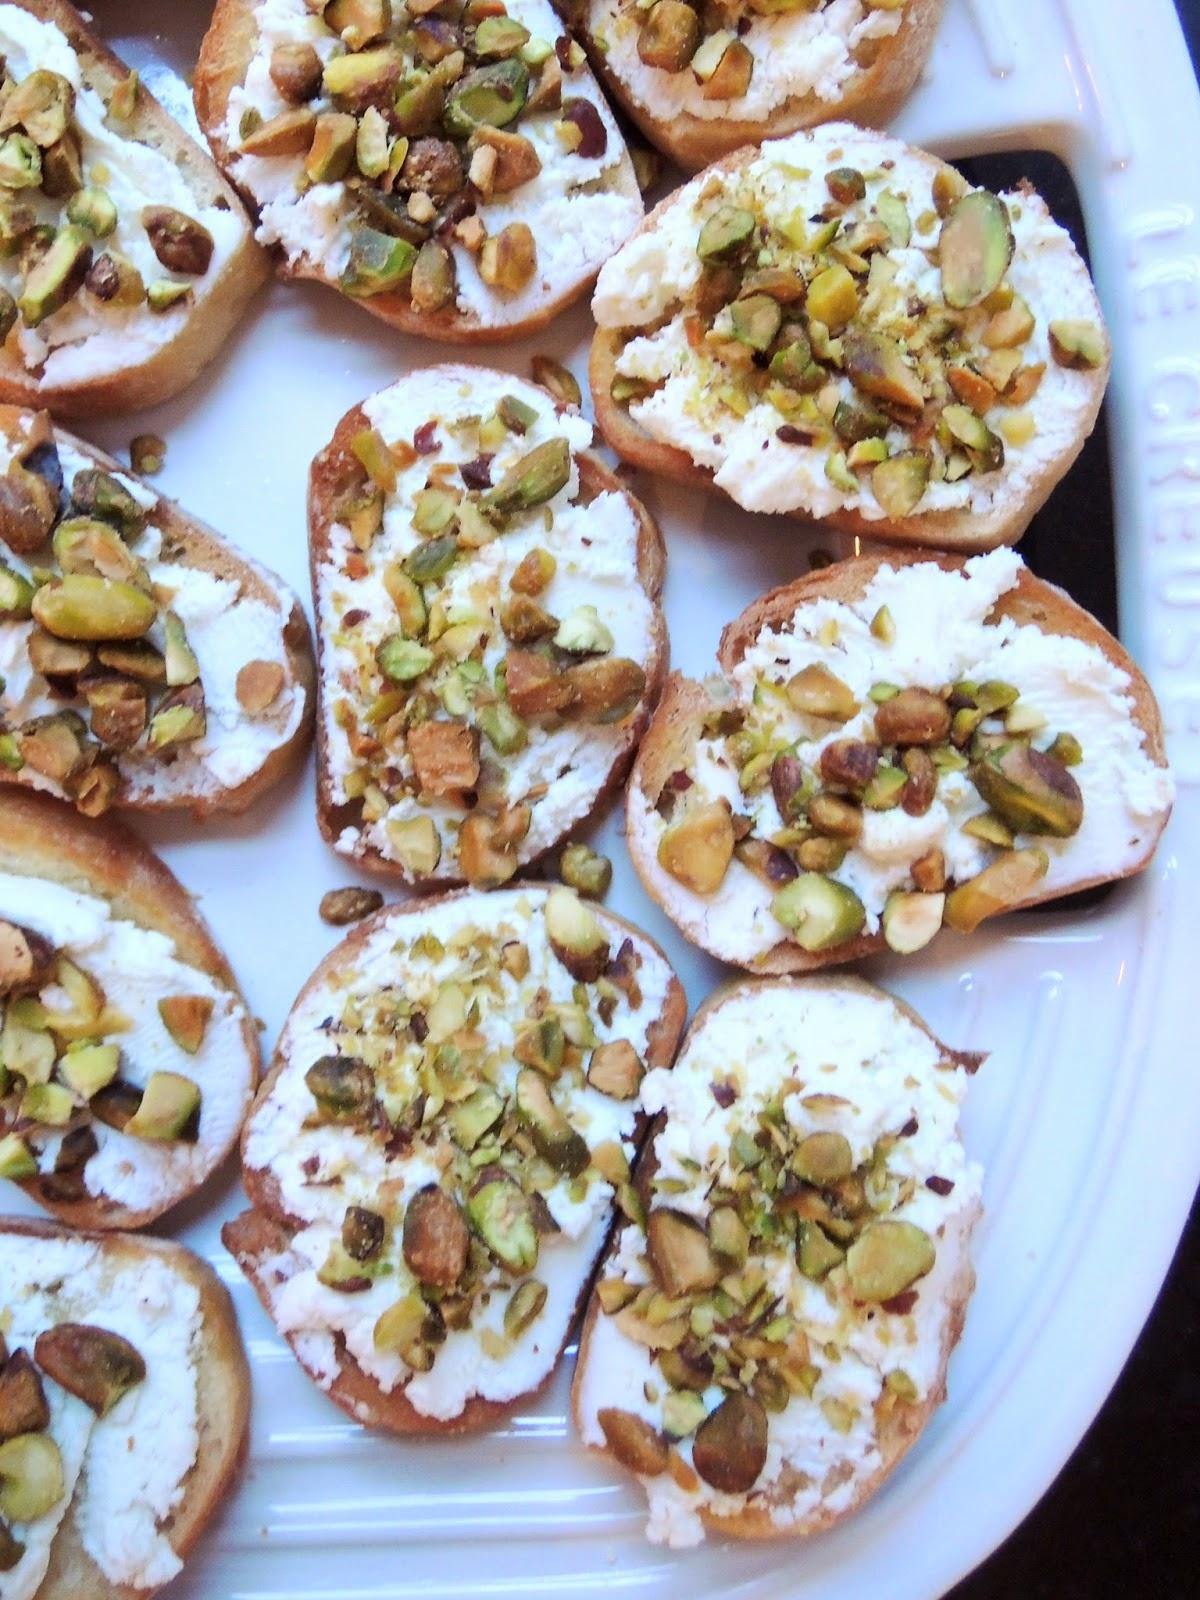 Goat cheese and pistachio crostini